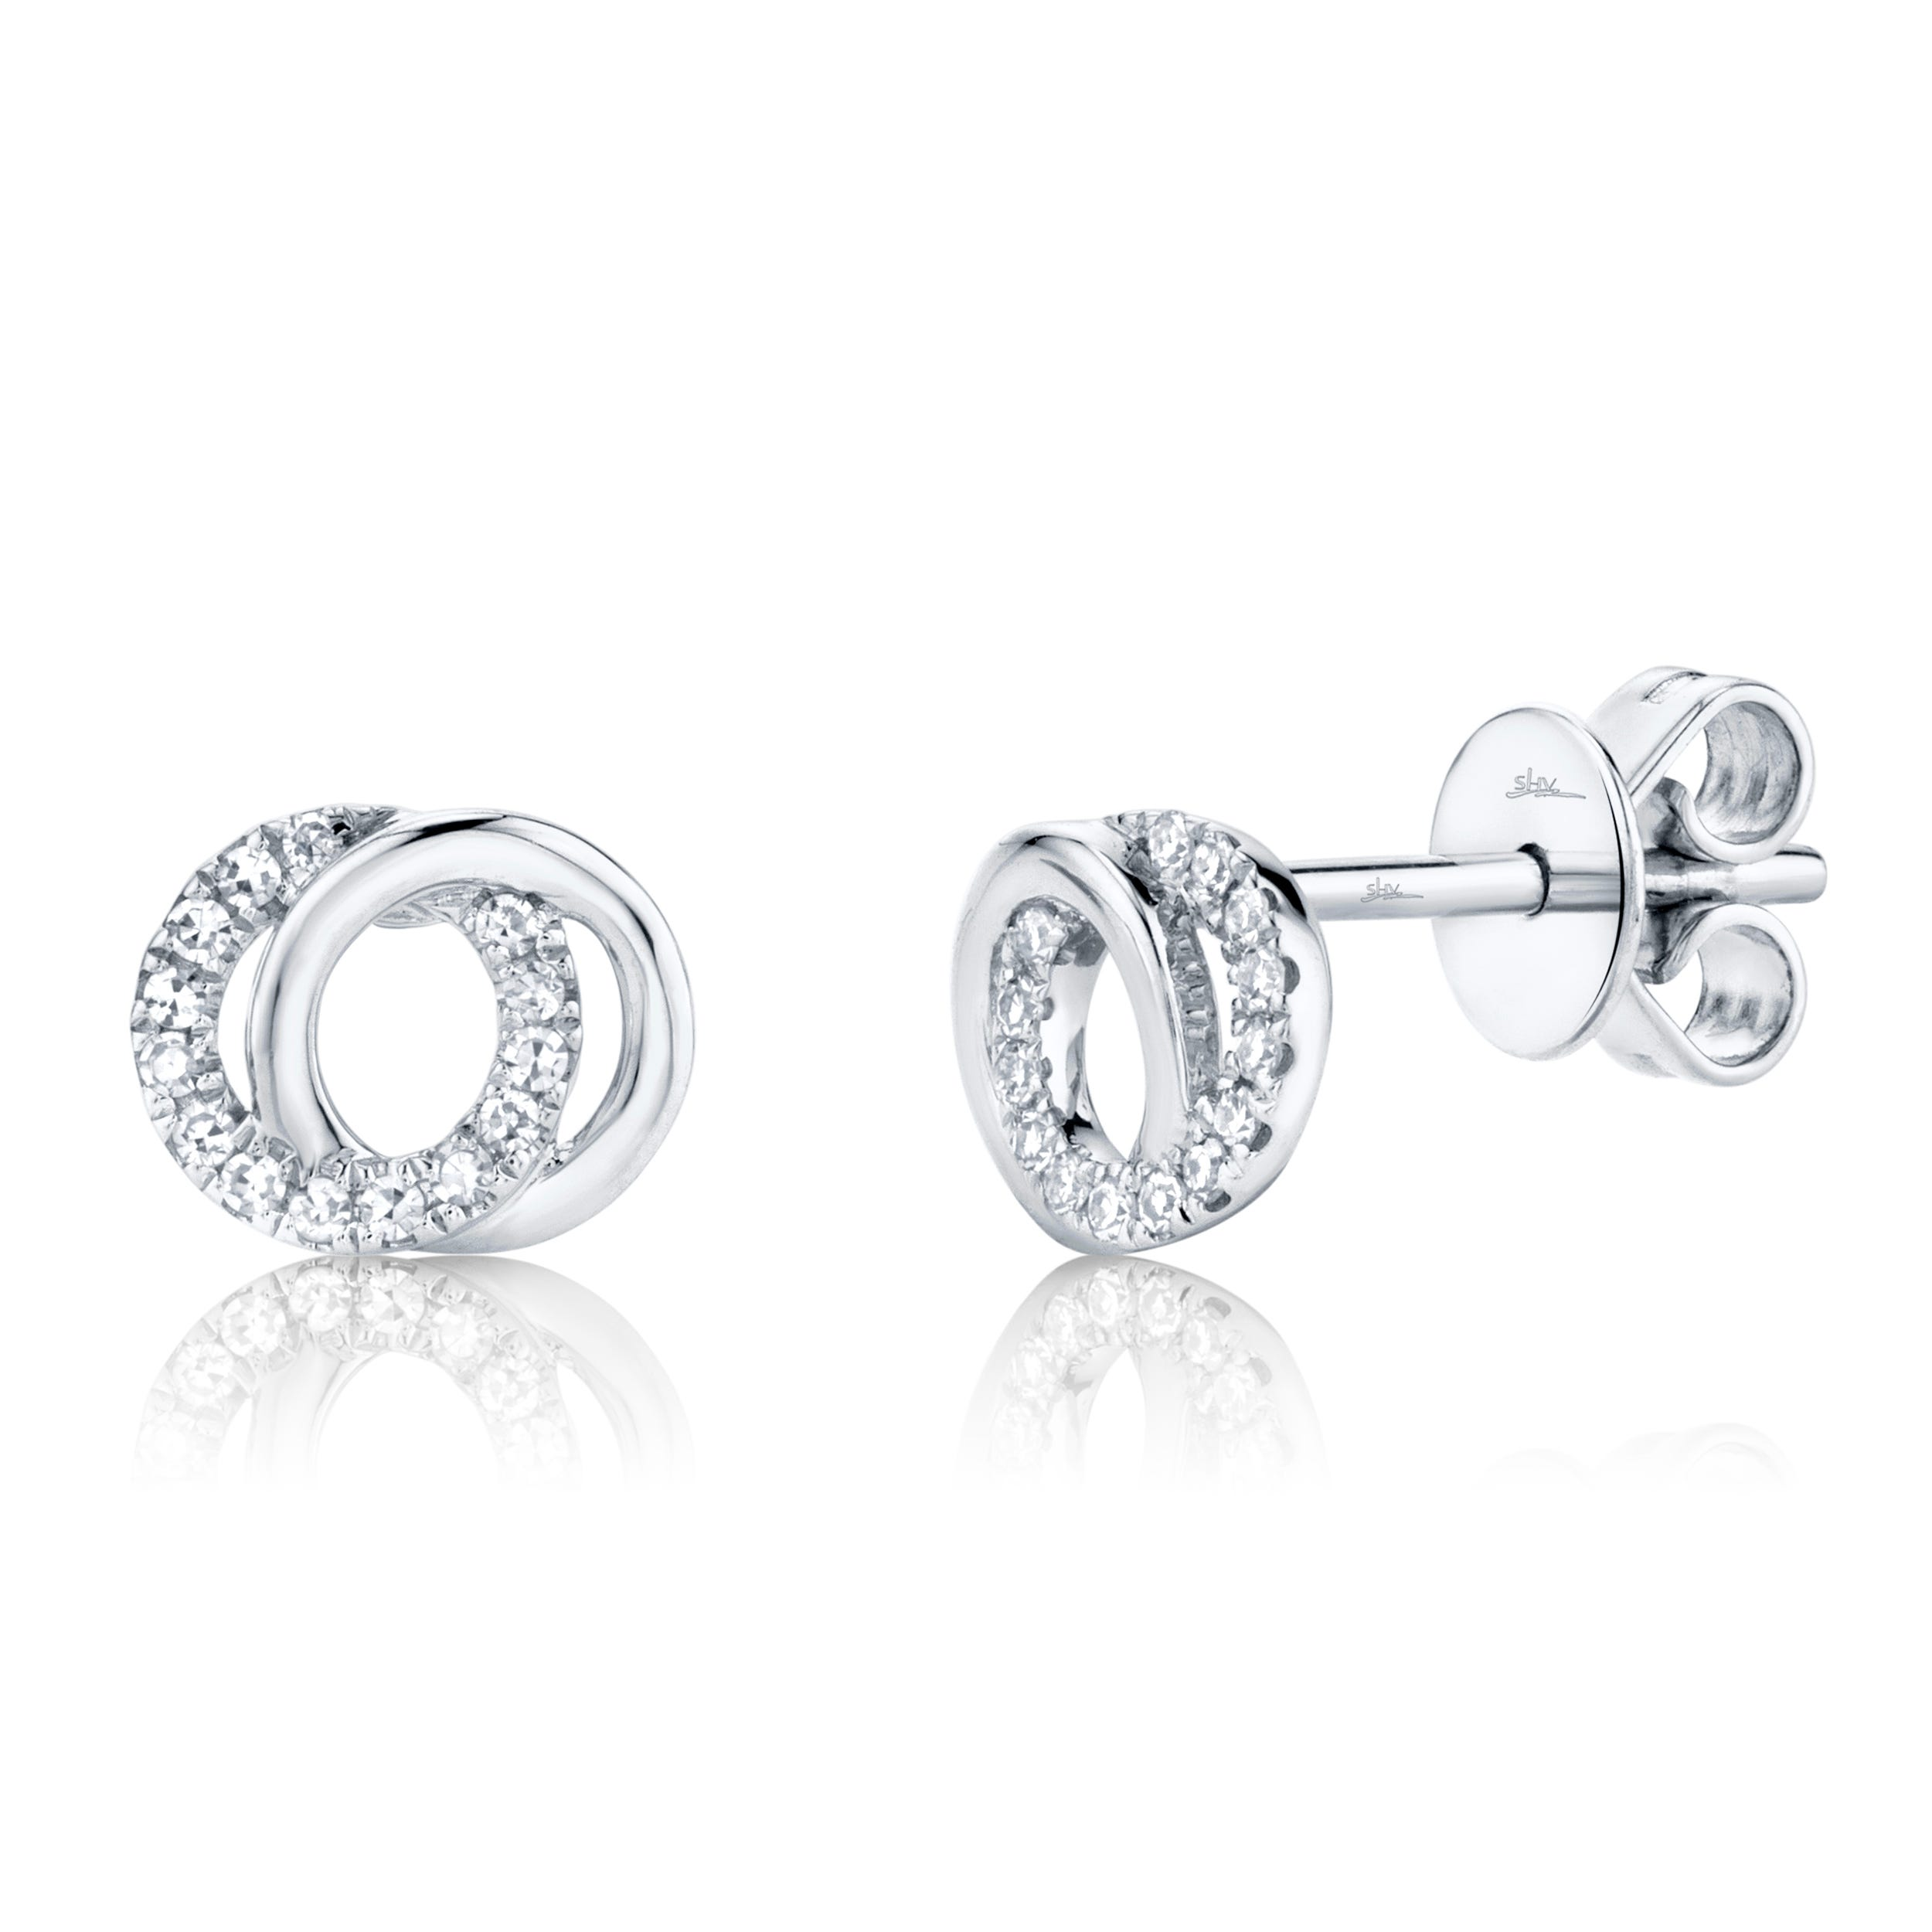 Shy Creation Diamond Love Knot Earrings in 14k White Gold SC55009821